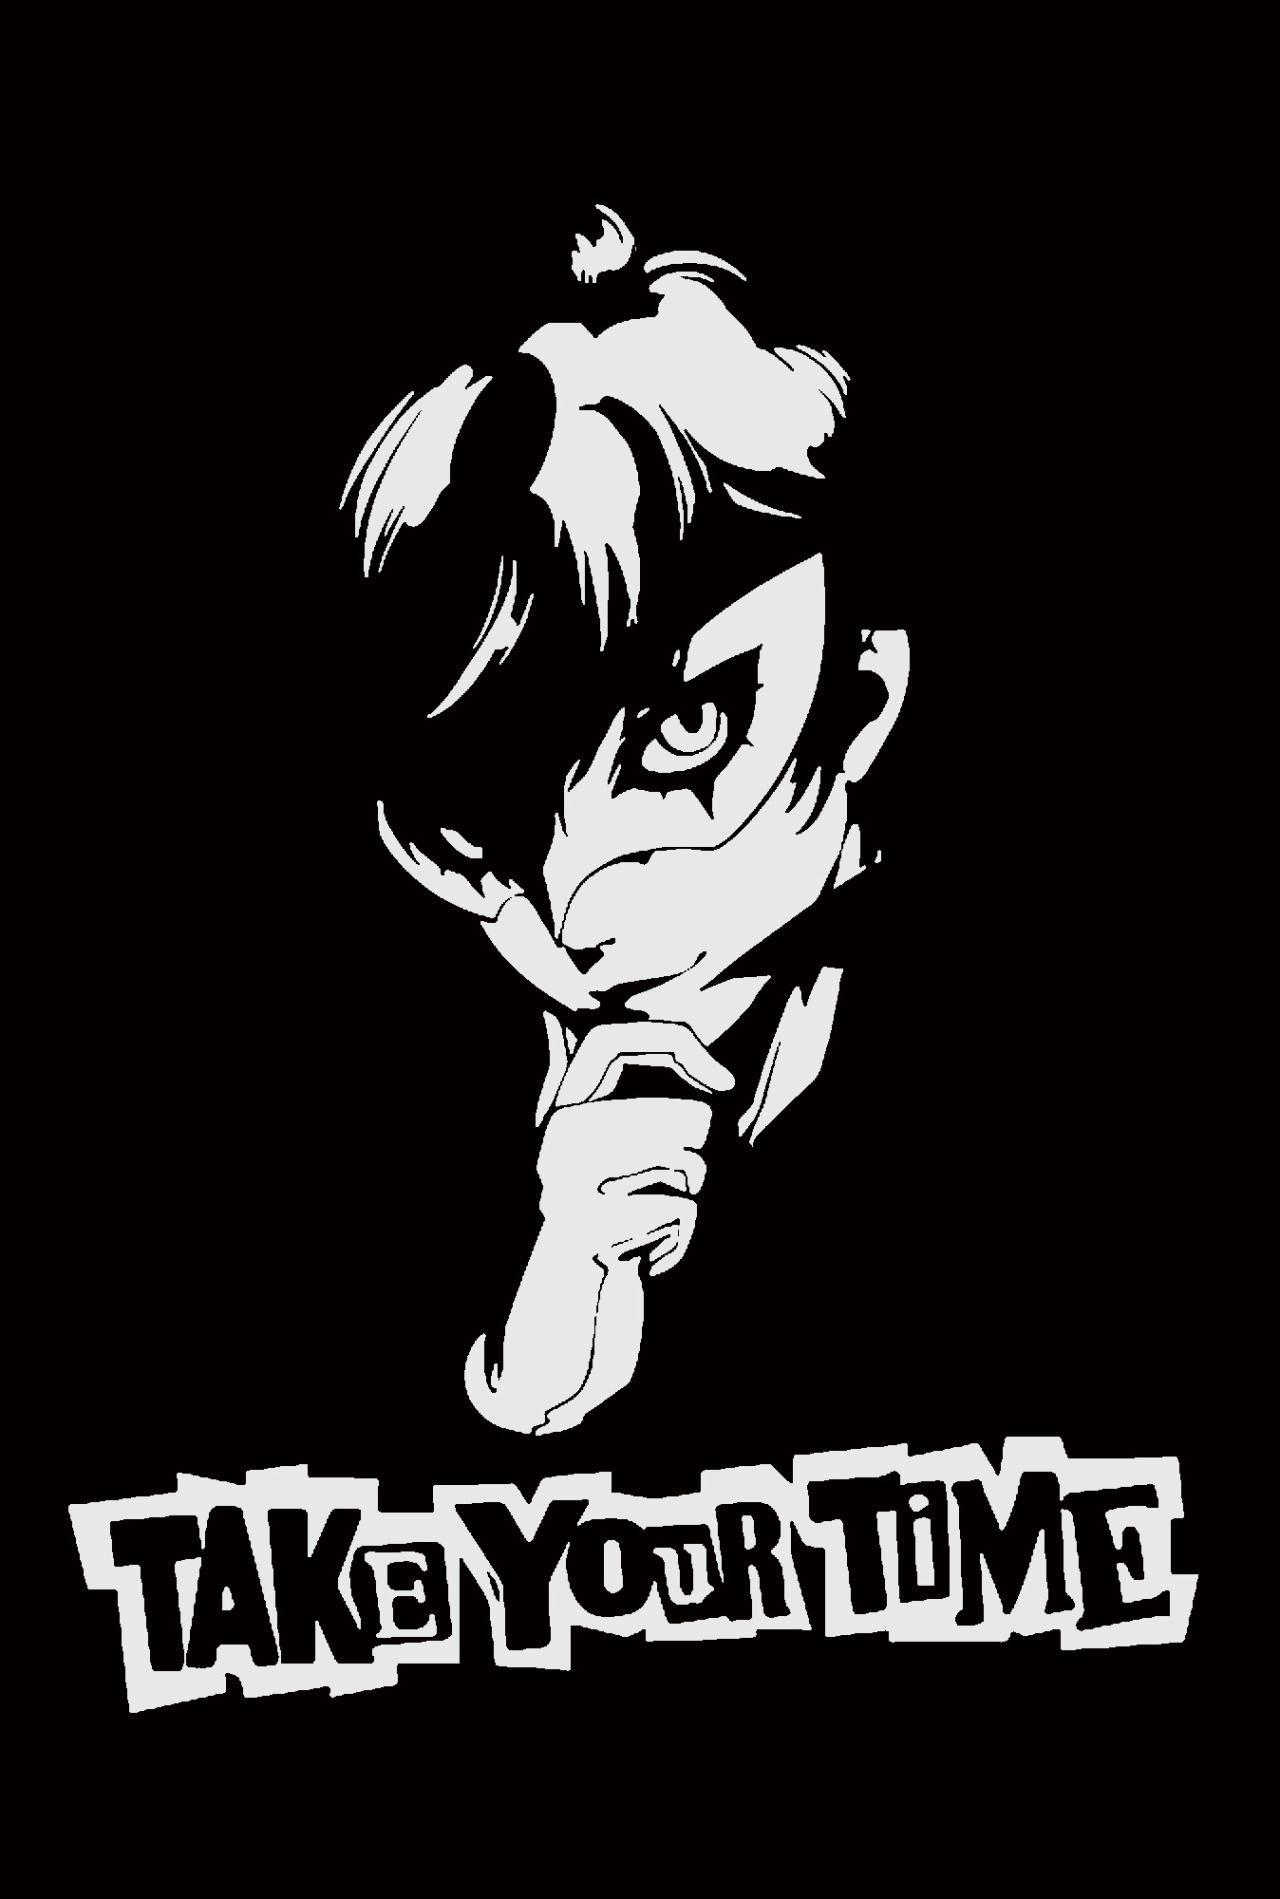 Persona 5 Persona 5 Persona 5 Joker Persona 5 Anime